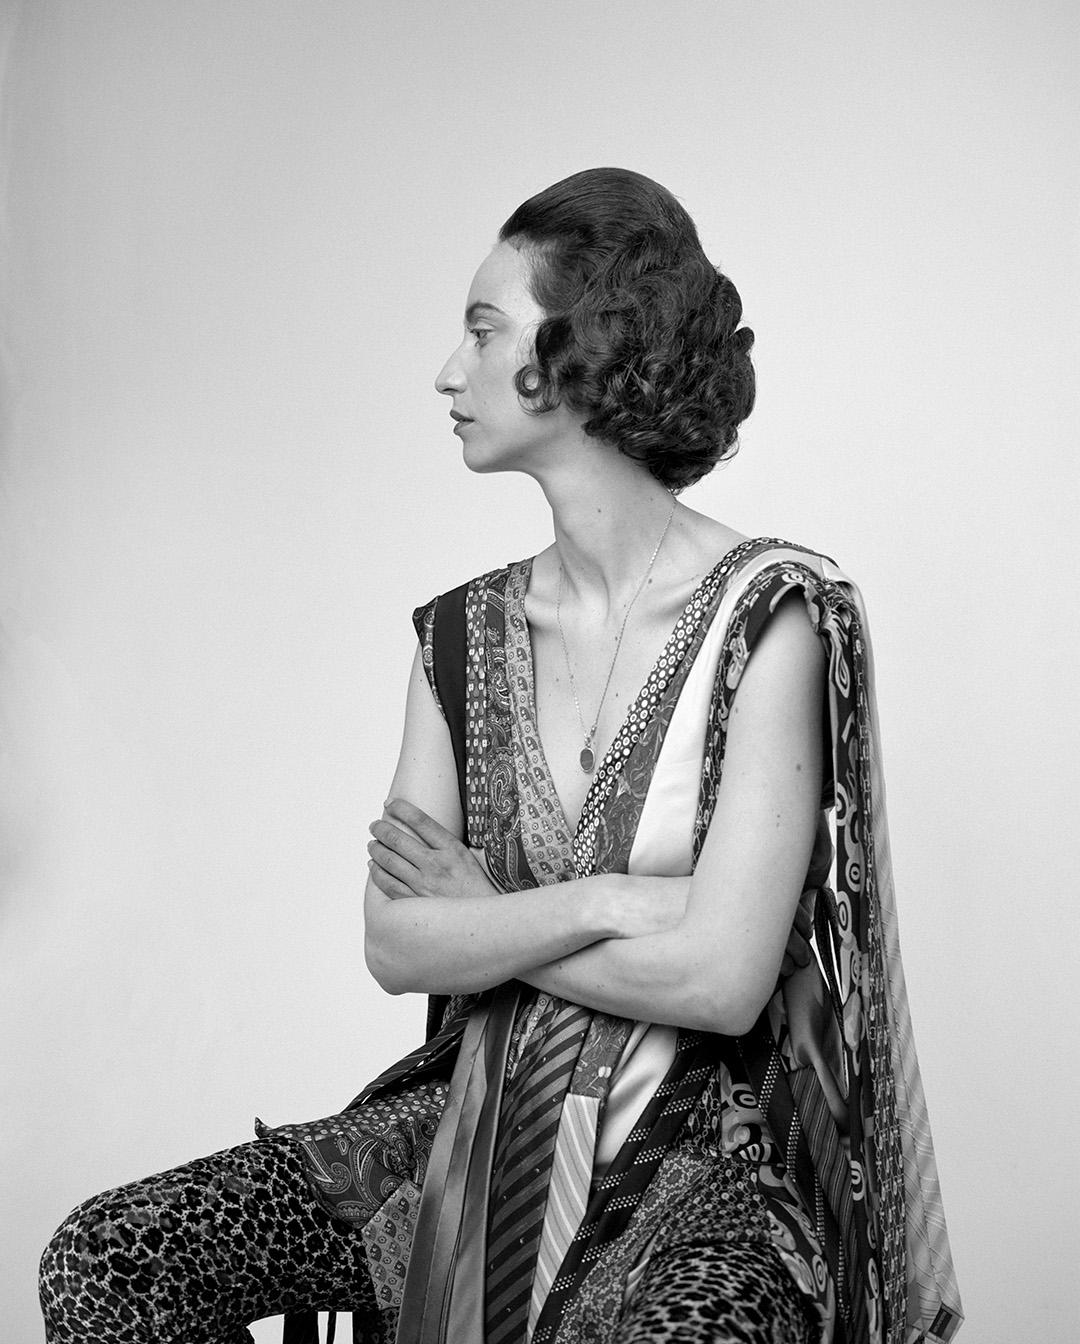 Valeria Herklotz